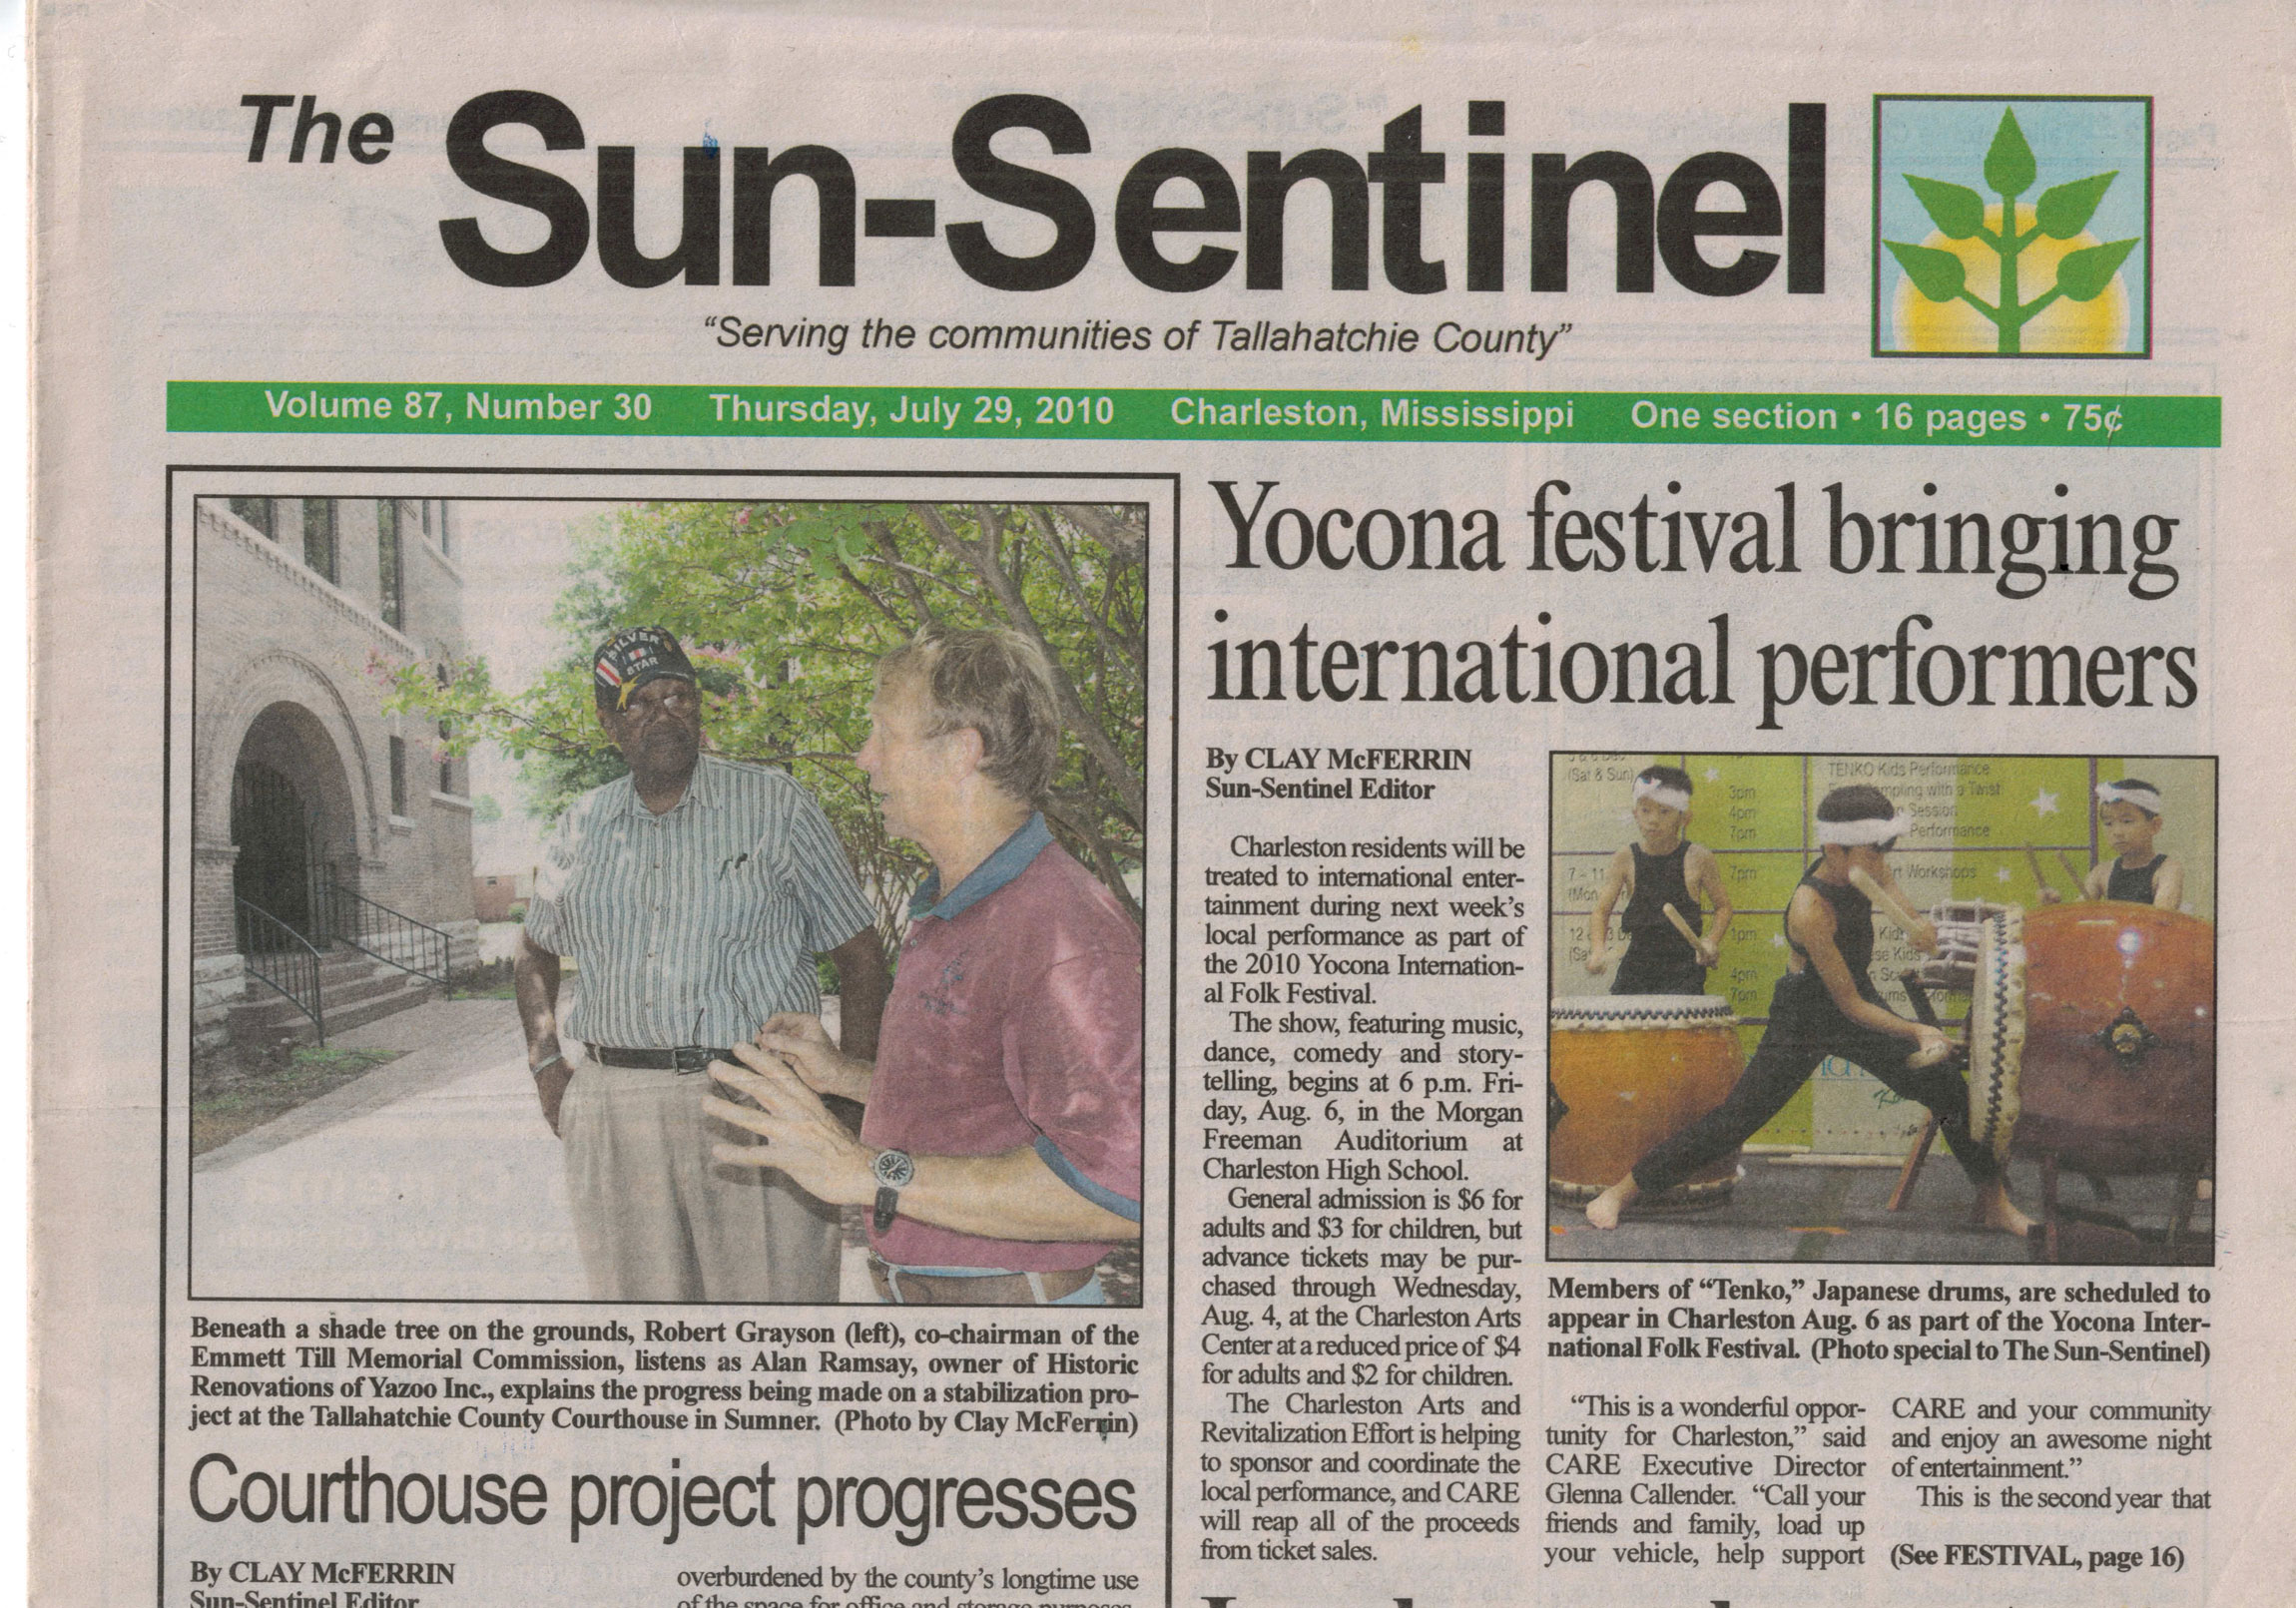 The-Sun-Sentinel-@U.-S.A--20-Jul-2010